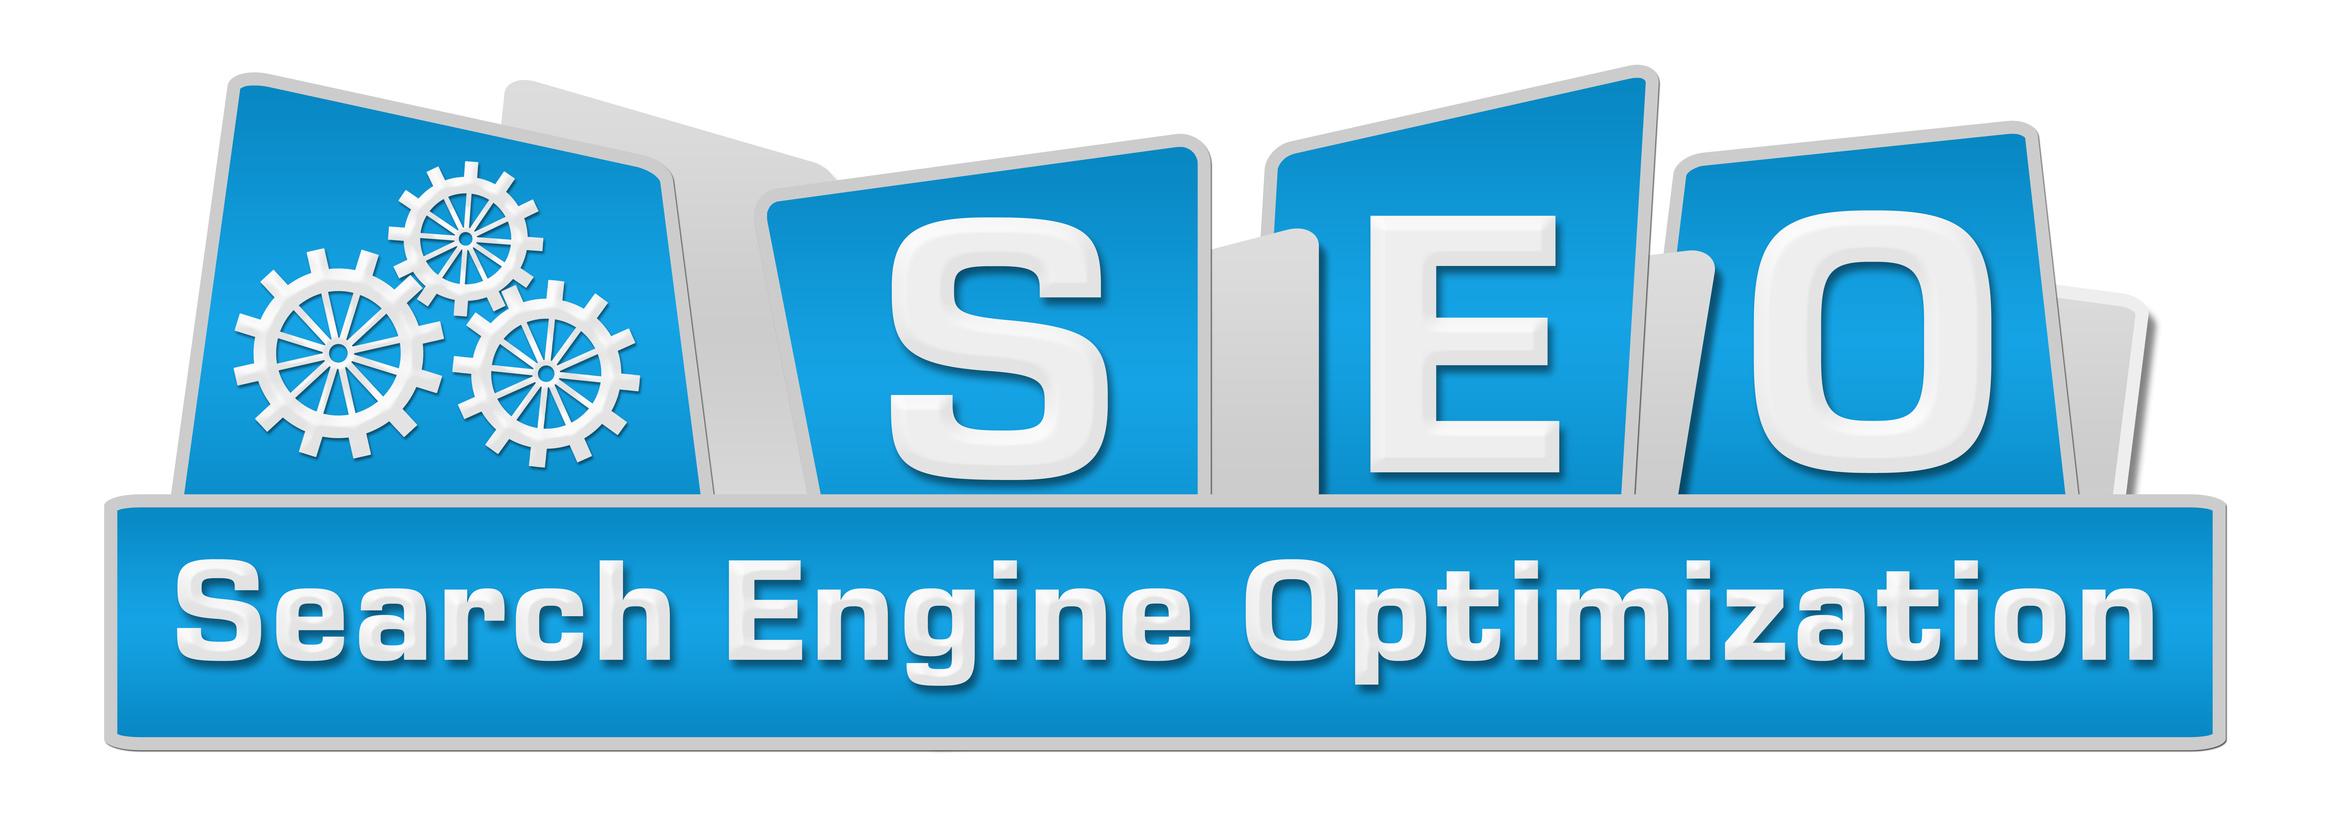 SEO Search Engine Optimization Live Training, Miami-Dade, Florida, United States